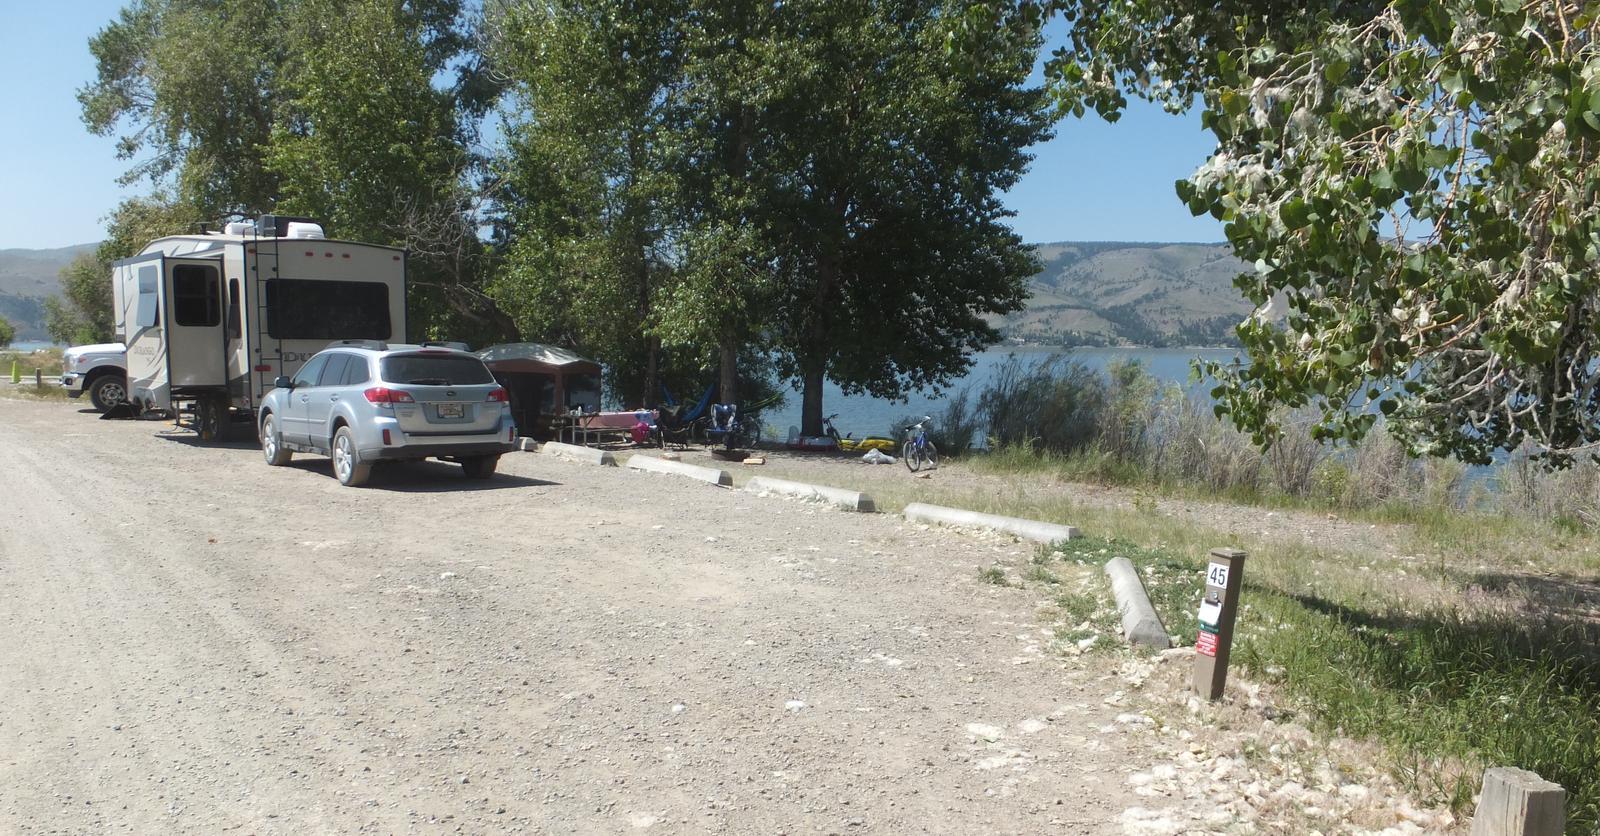 Hellgate  Campground - Campsite 45